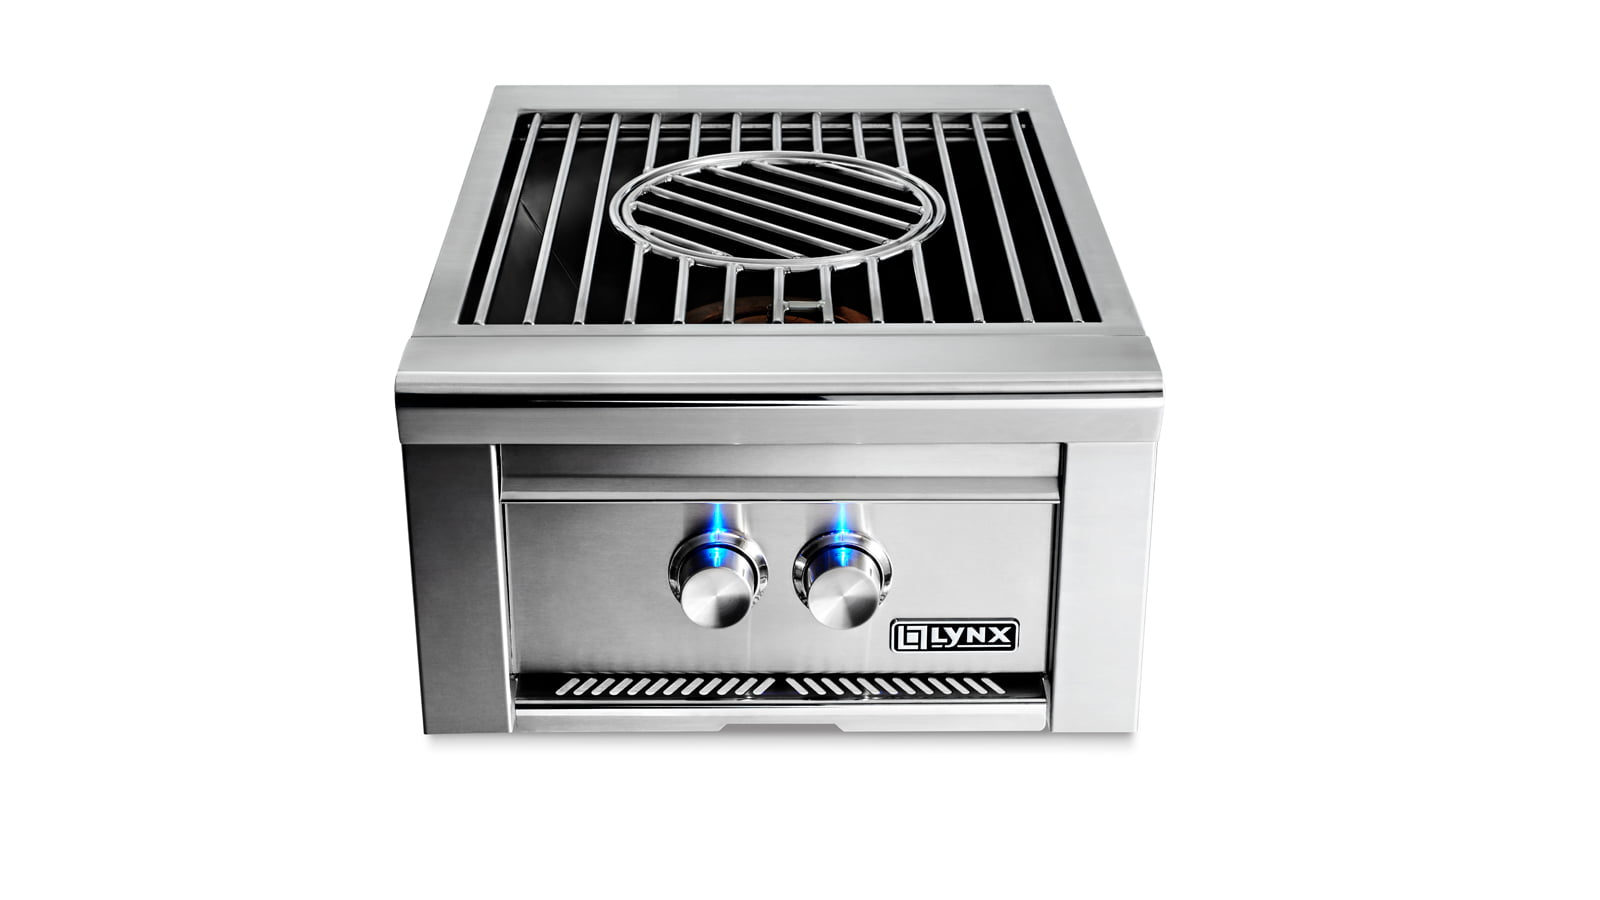 Lynx Professional Power Burner Lpb My Outdoor Kitchen